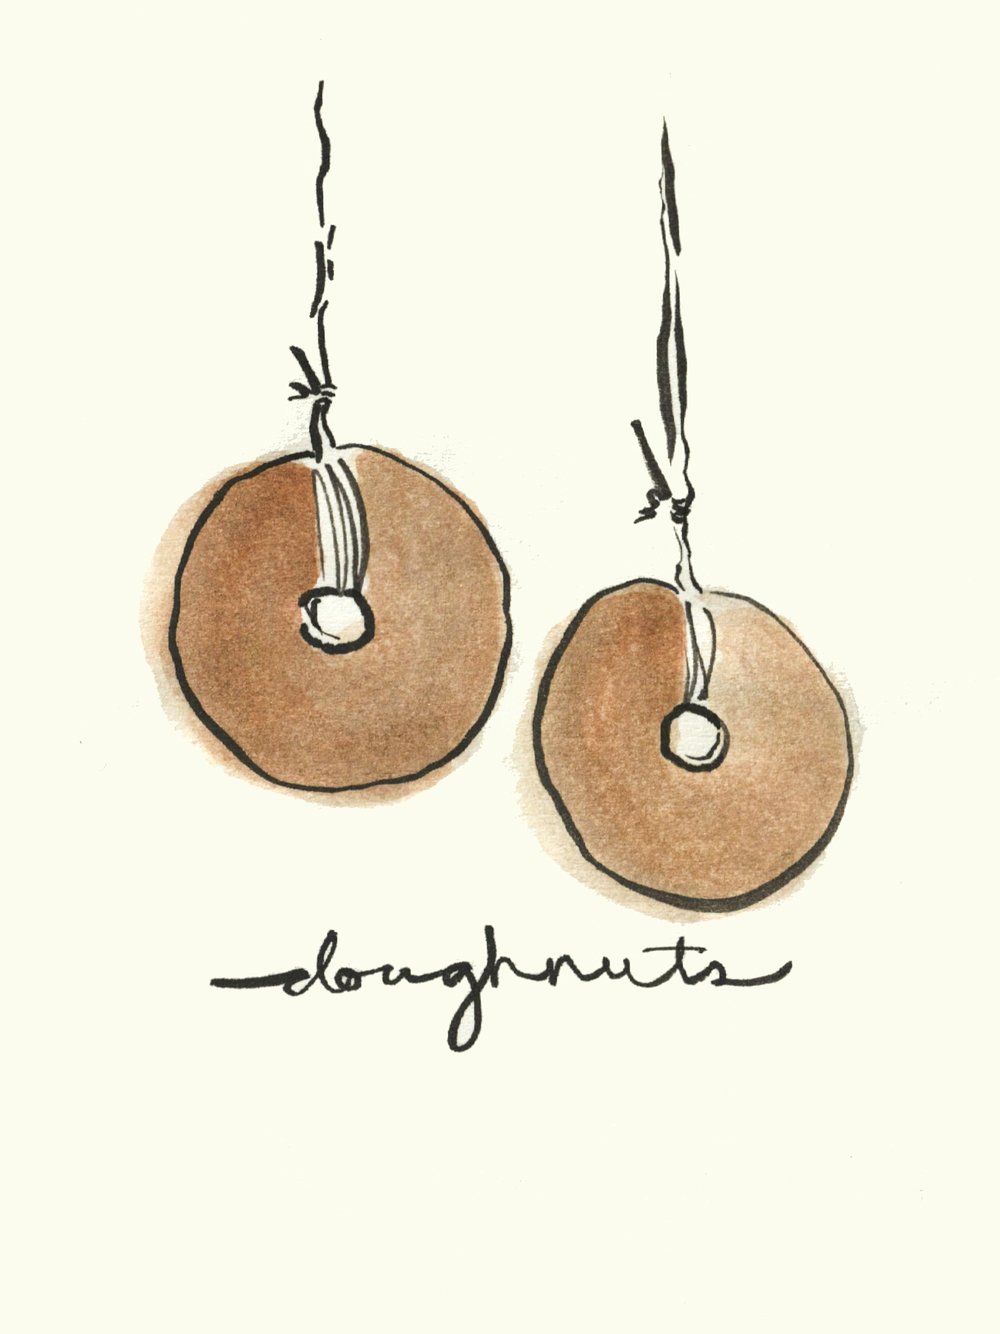 D_Doughnut.jpg